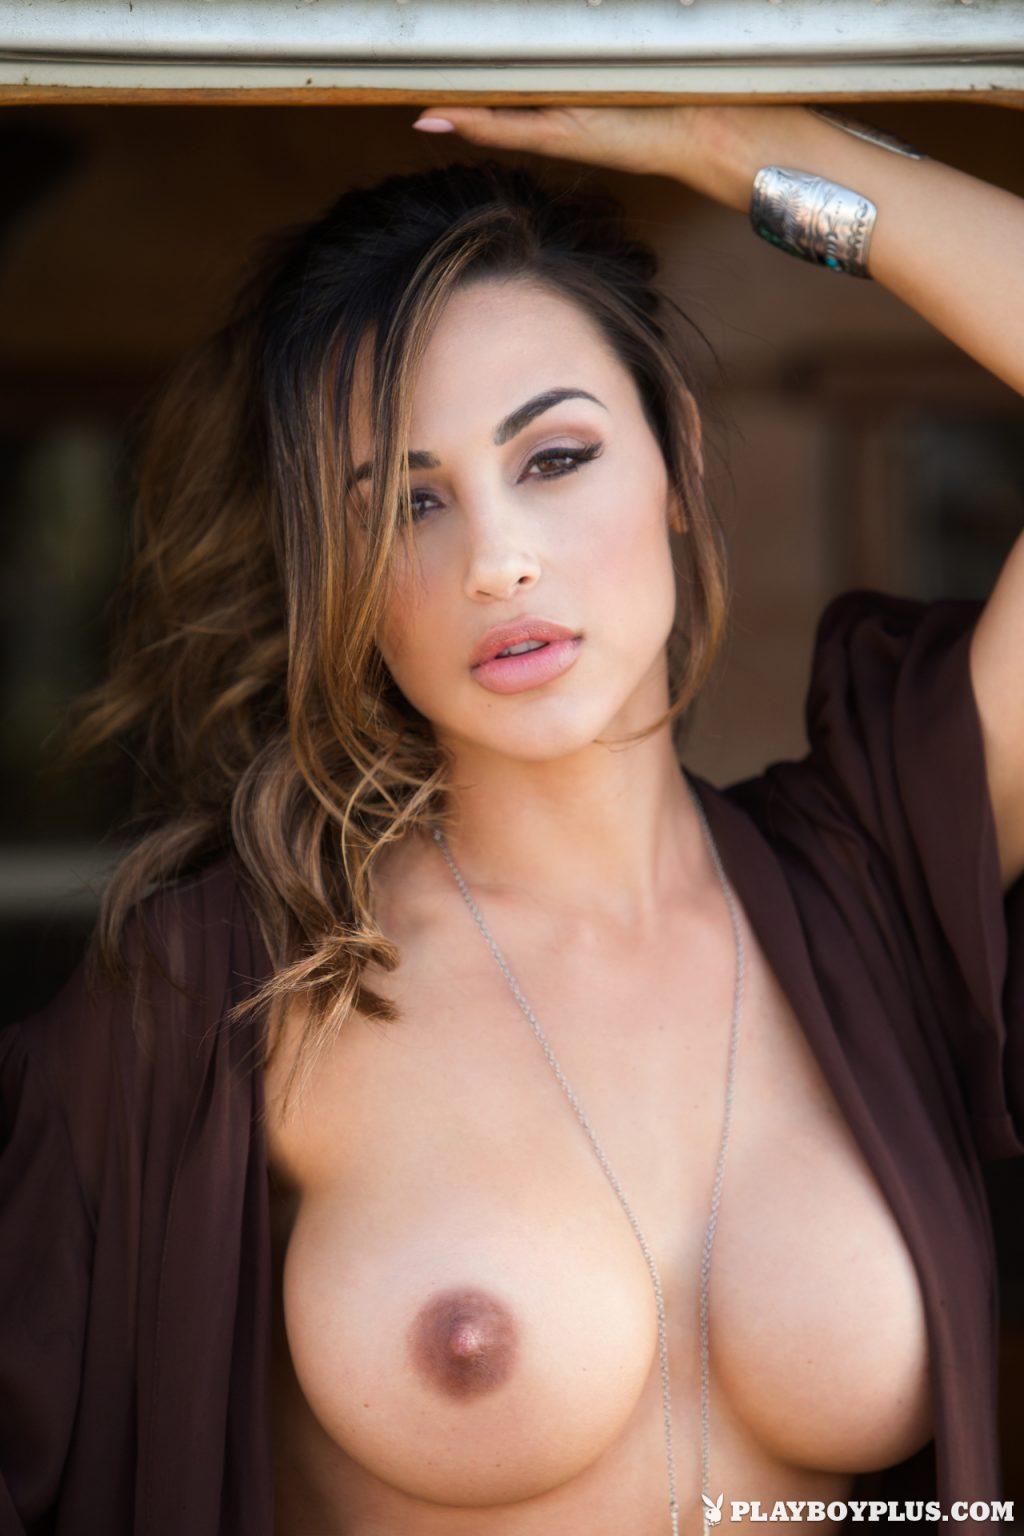 Ana Belen Nude ana cheri nude (5 photos) – ( ͡° ͜ʖ ͡°) |the fappening